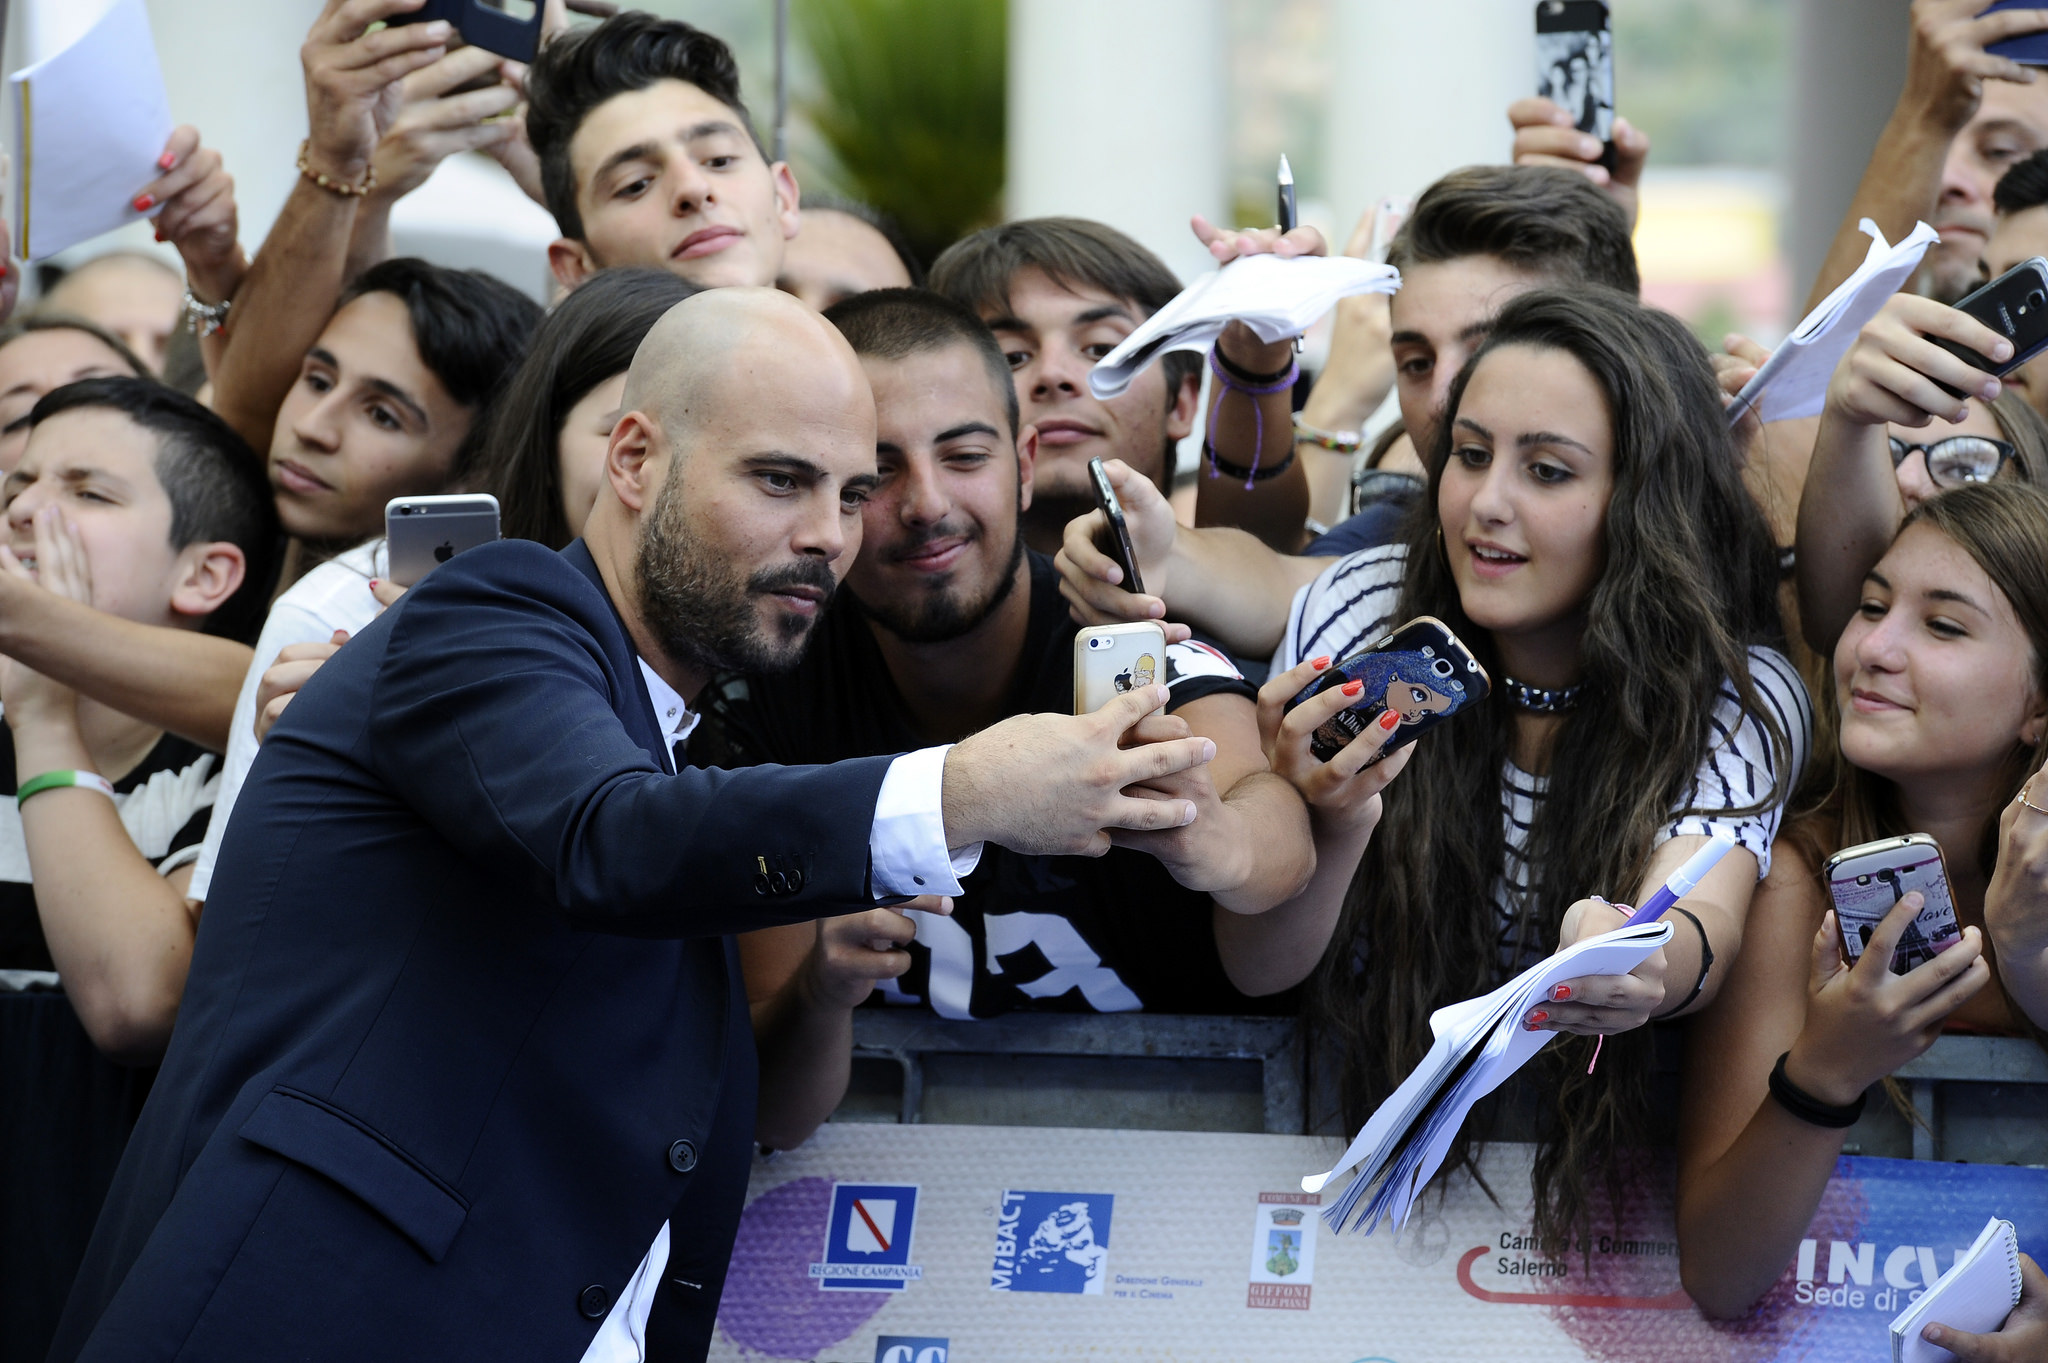 http://www.salernonotizie.net/wp-content/uploads/2018/03/Marco-DAmore-a-Giffoni-1.jpg